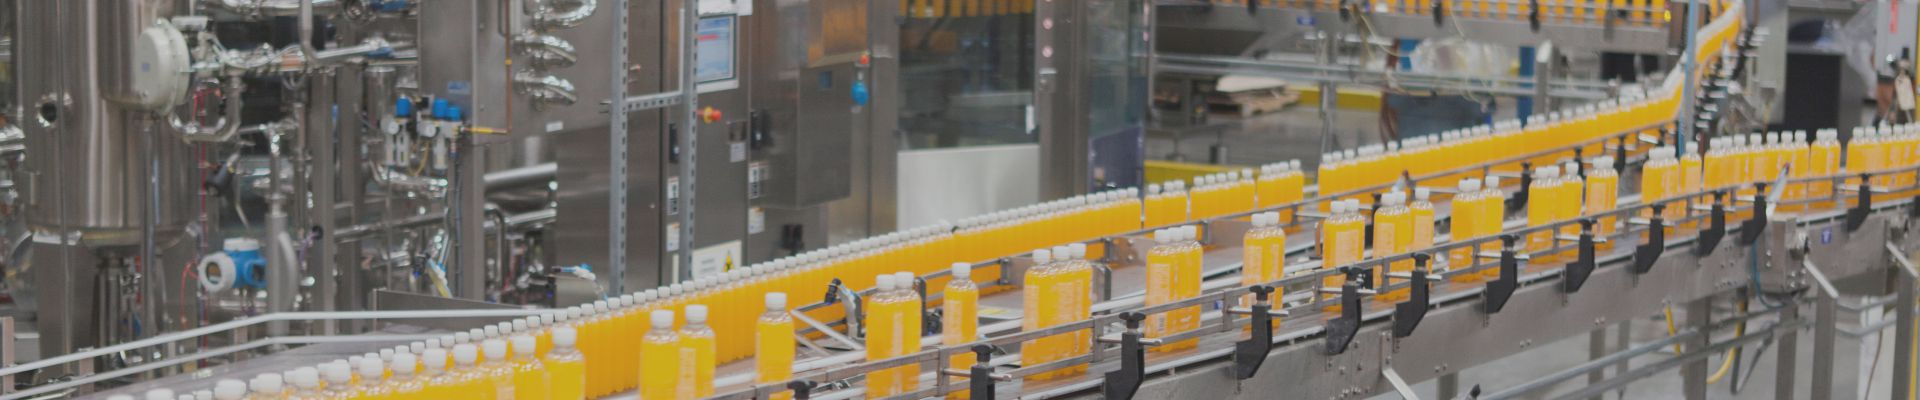 Macchine industriali slide